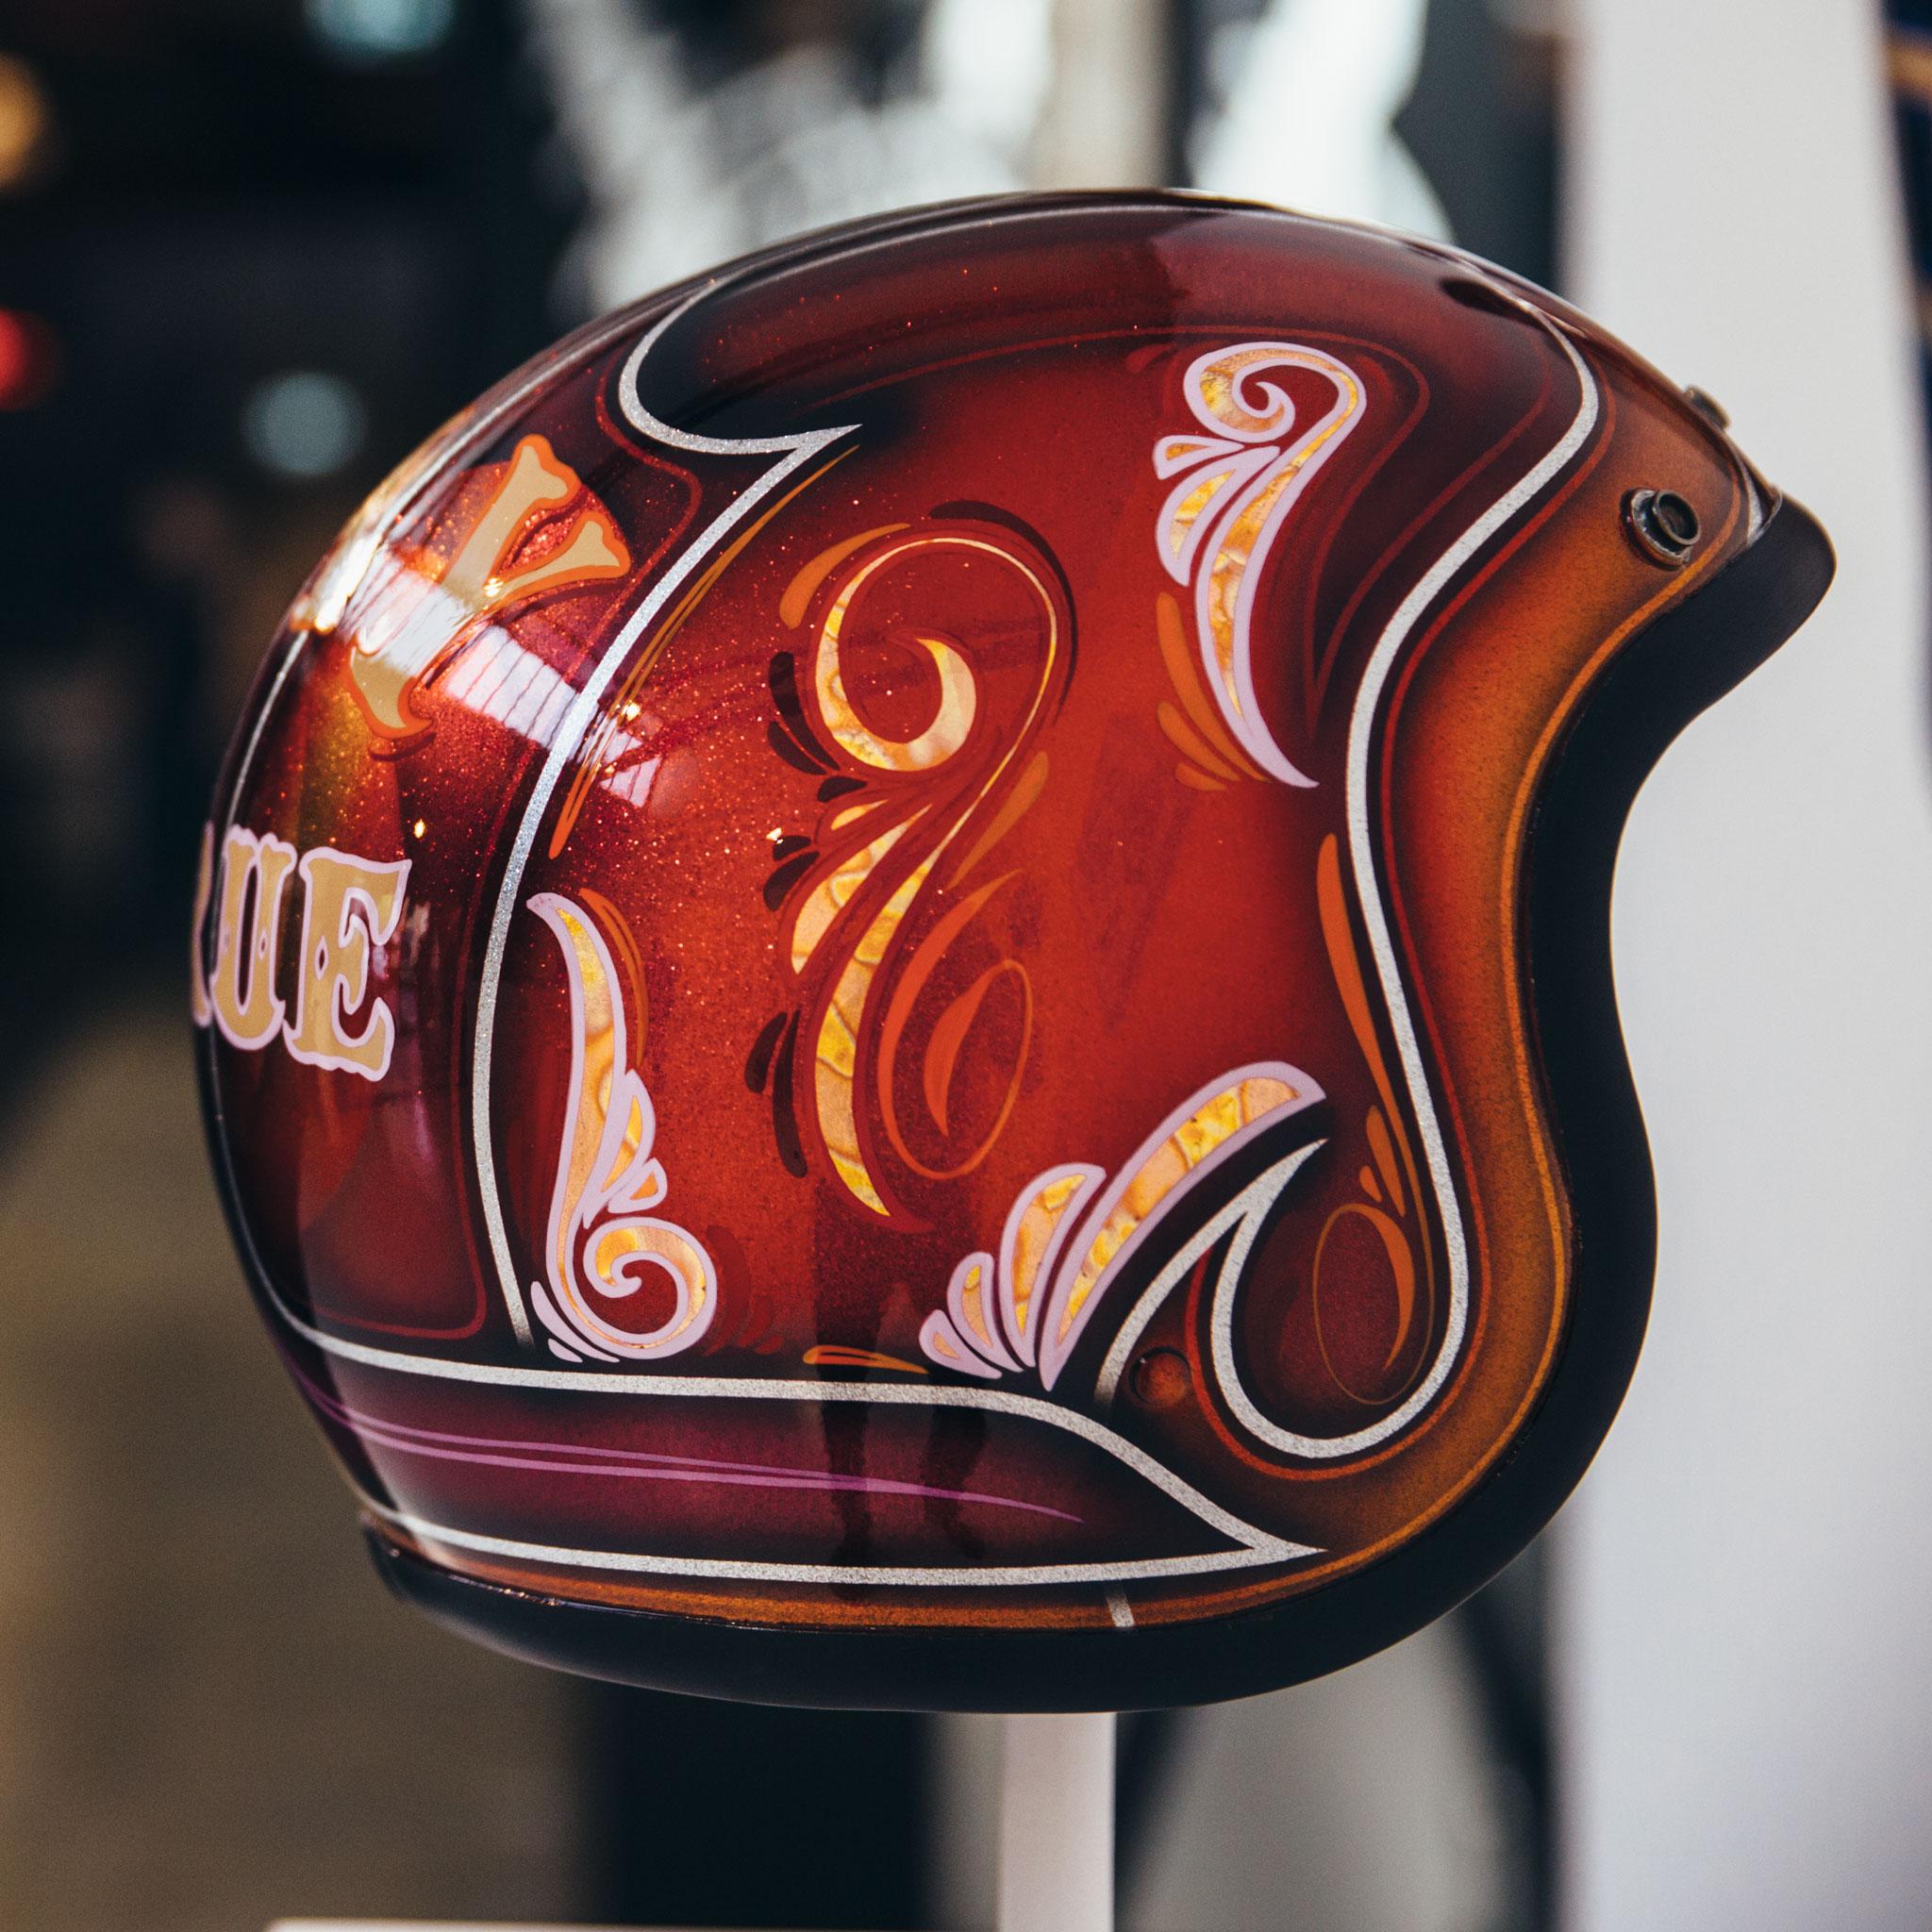 Art Pharamacy_Vandal Gallery_Sabotage MotorcyclesTwenty20_exhibition_5499.jpg